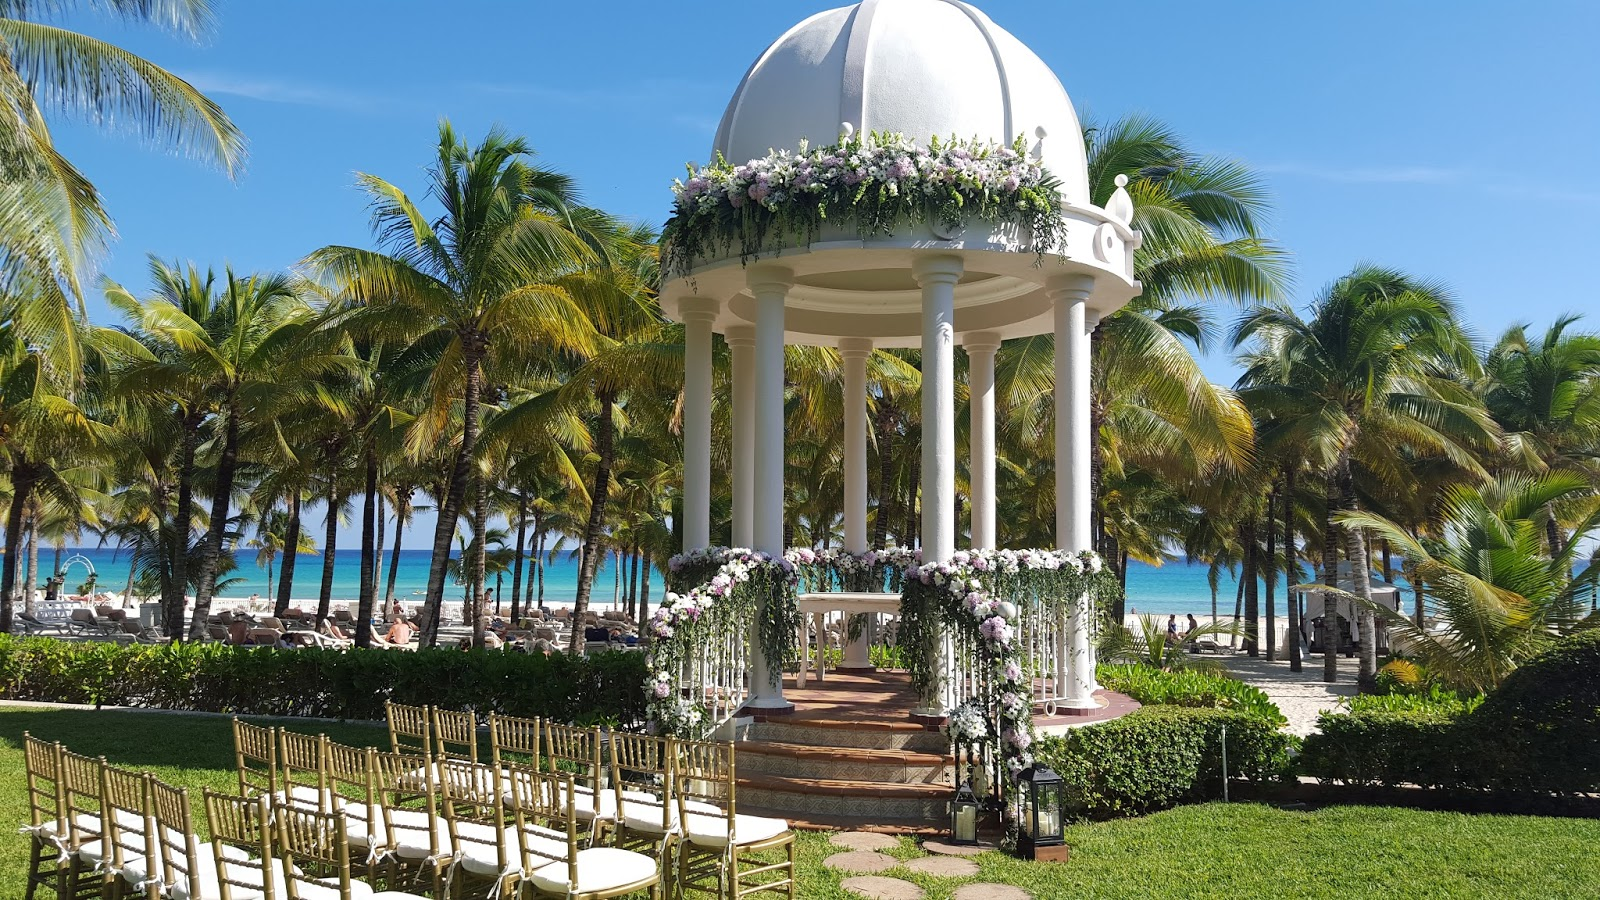 Ideas fant sticas de gazebos para tu boda en la playa for Gazebo proiettato con camino